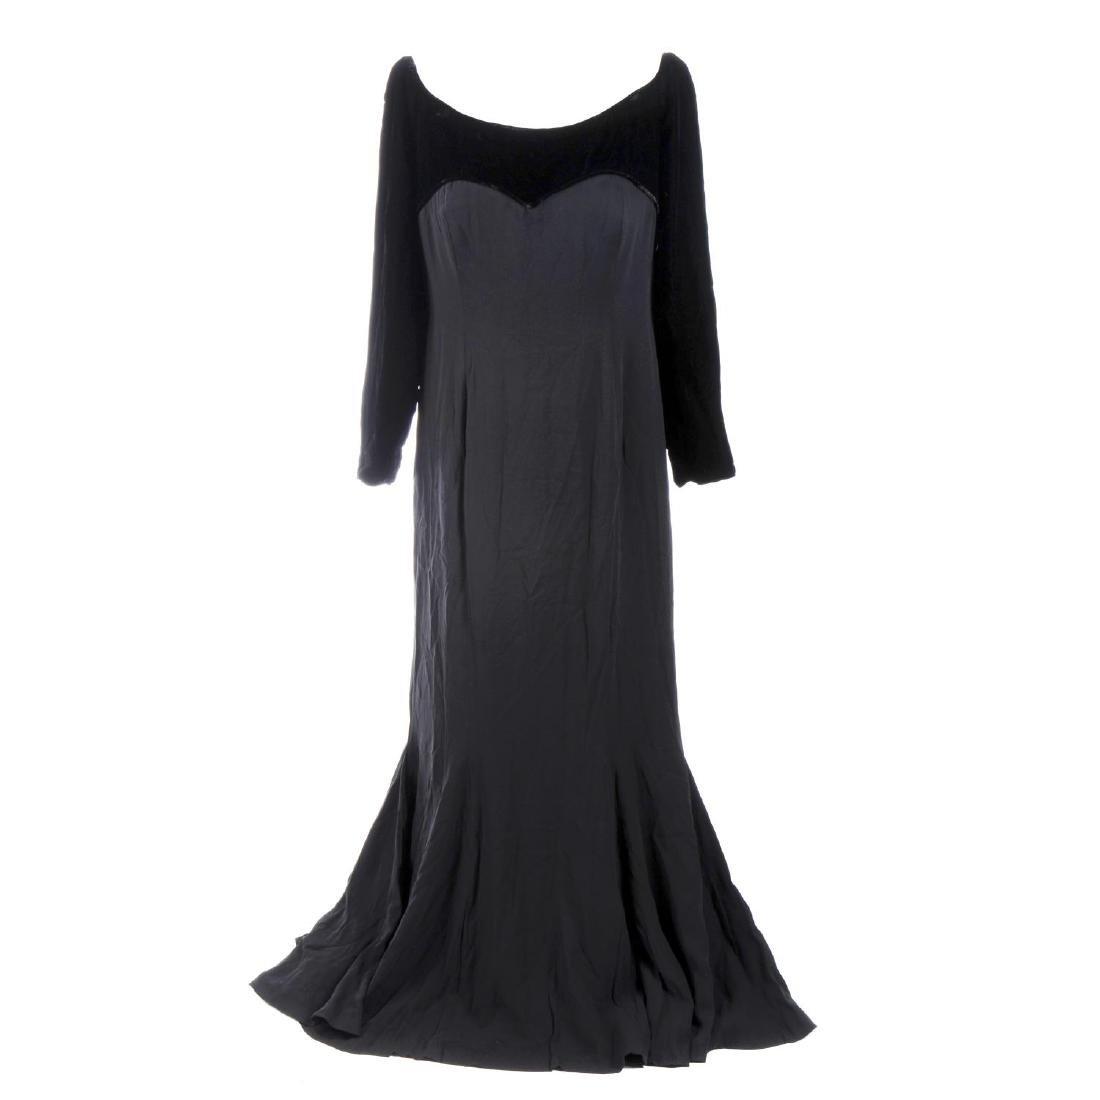 CATHERINE WALKER - a velvet dress. The black pure silk